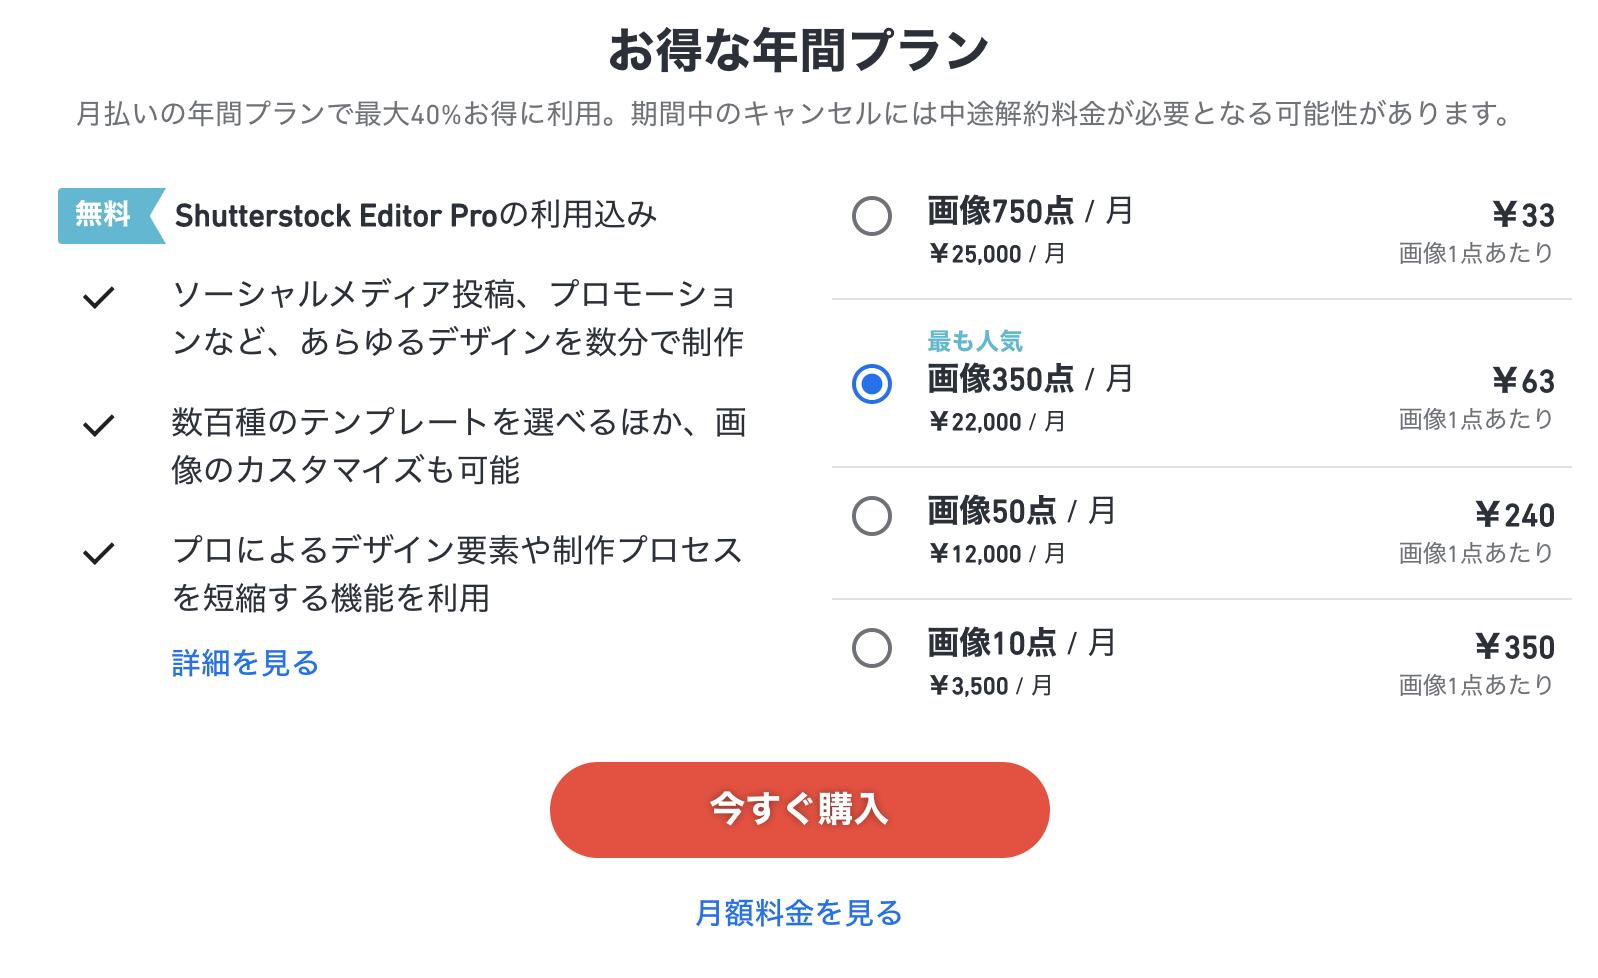 Shutterstock(シャッターストック)